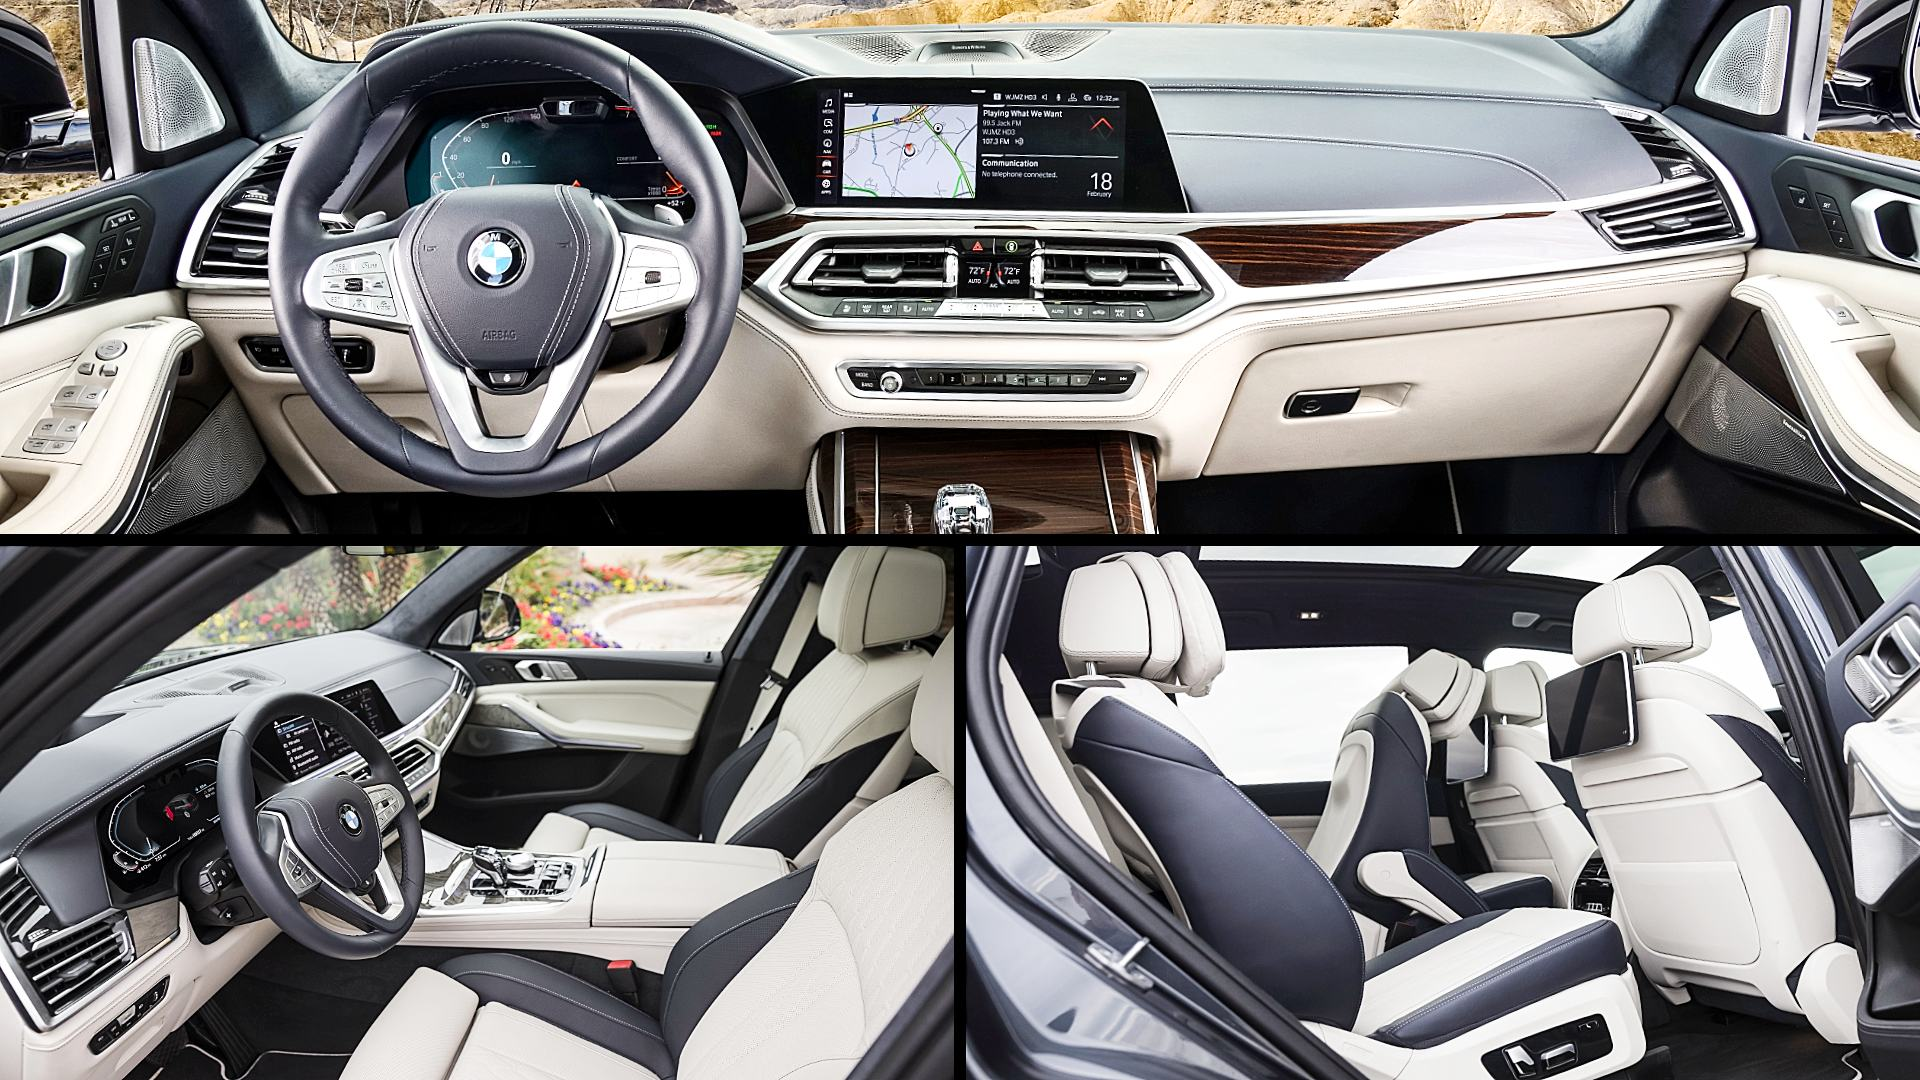 2020 Bmw X7 Xdrive40i Interior Images